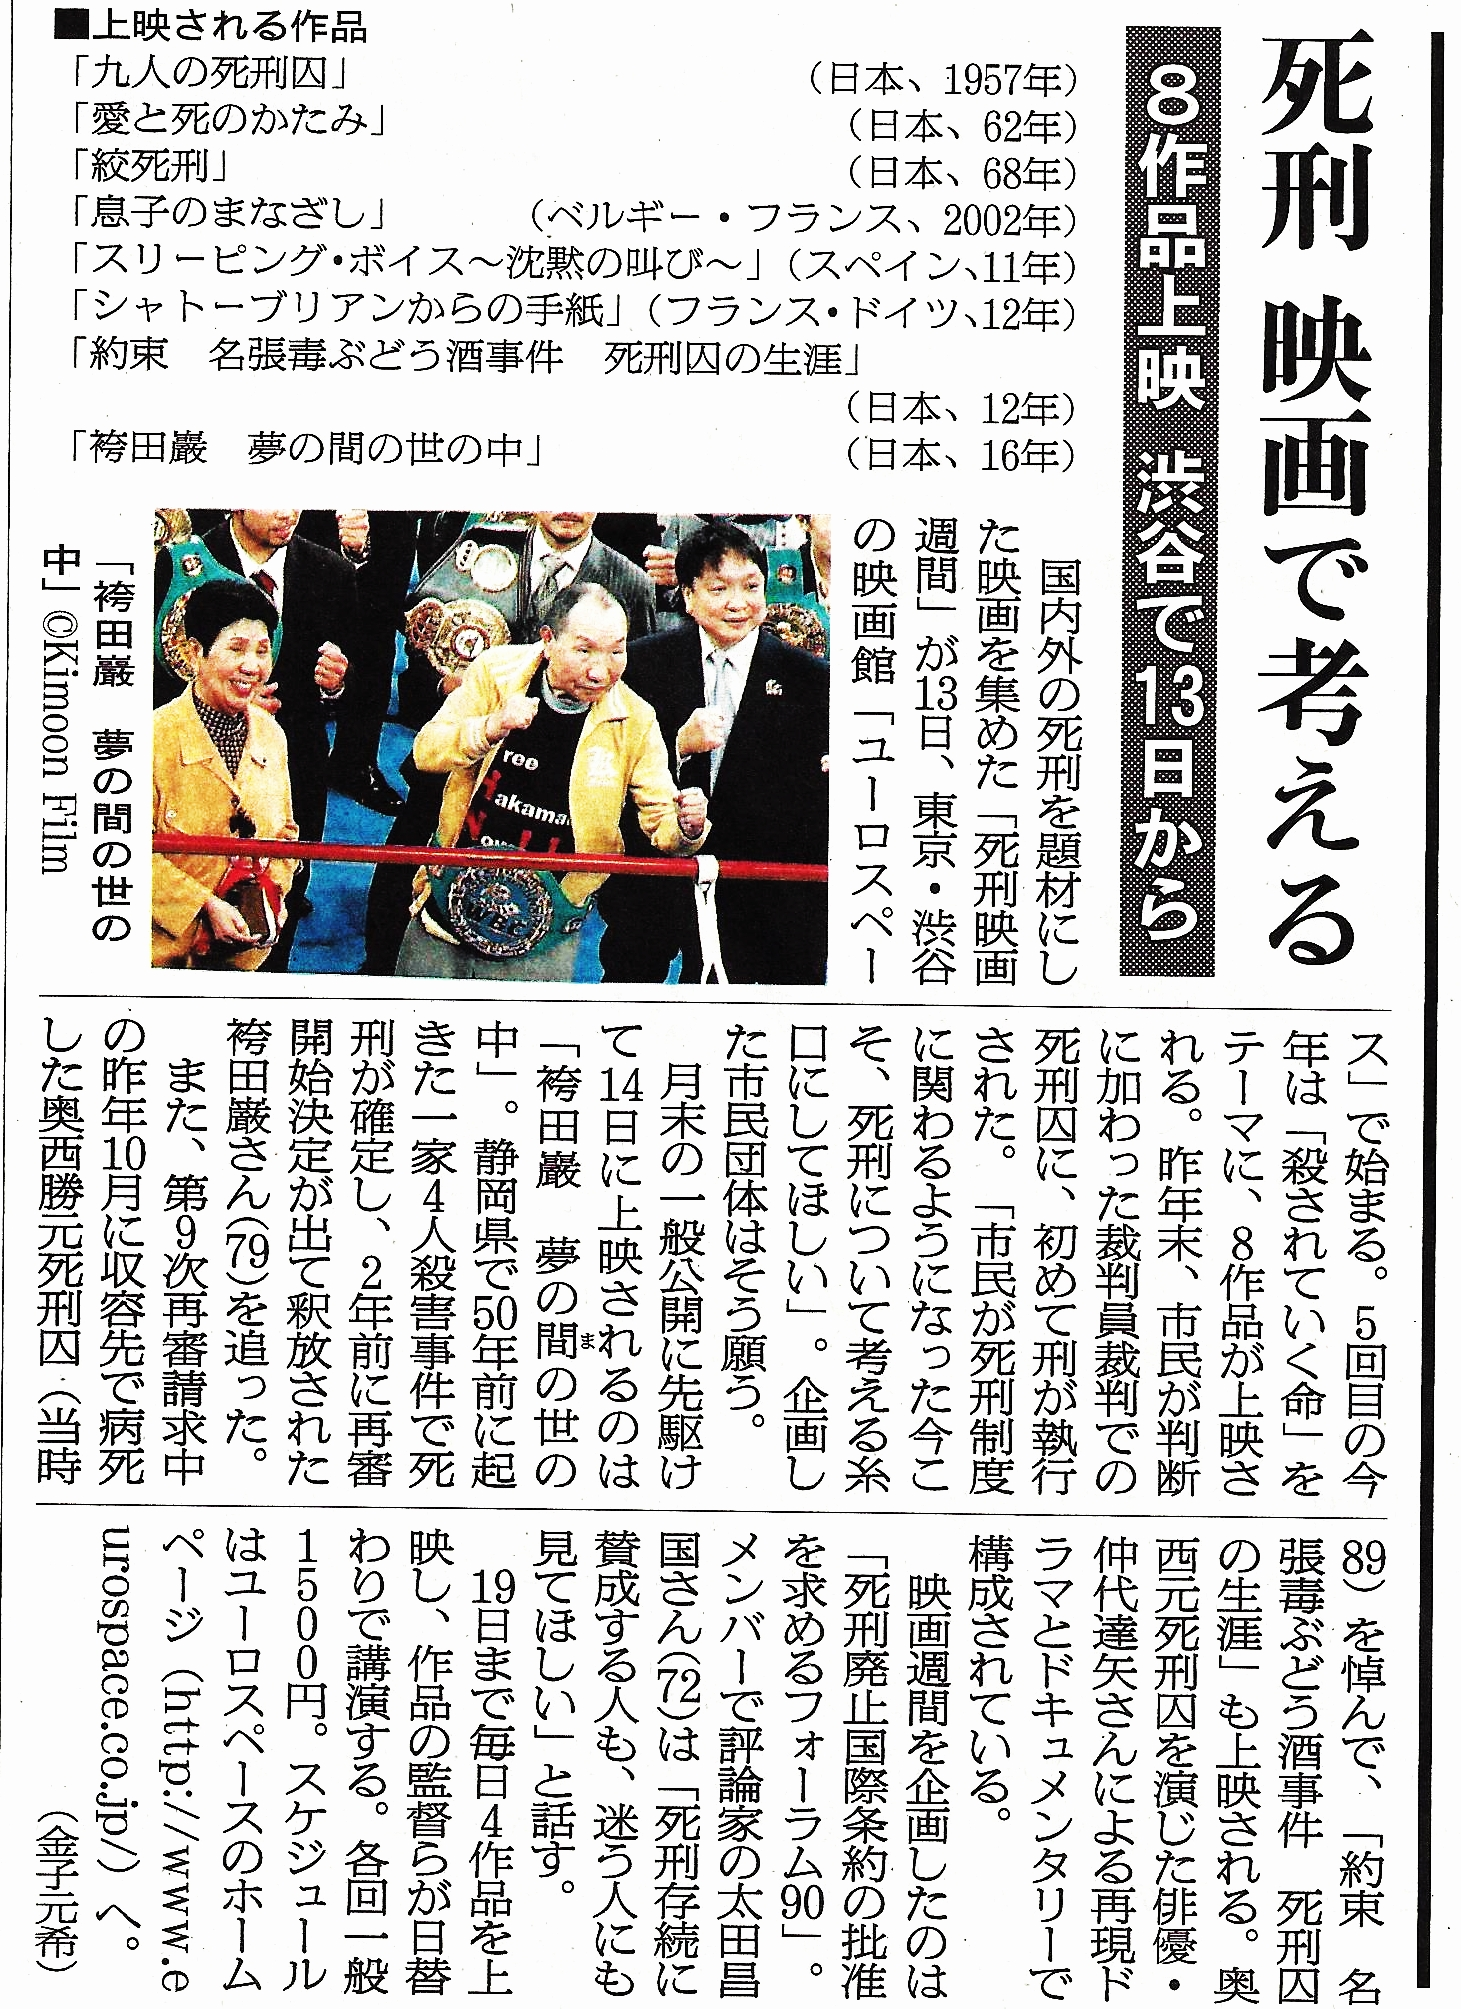 2016.2.10朝日新聞夕刊